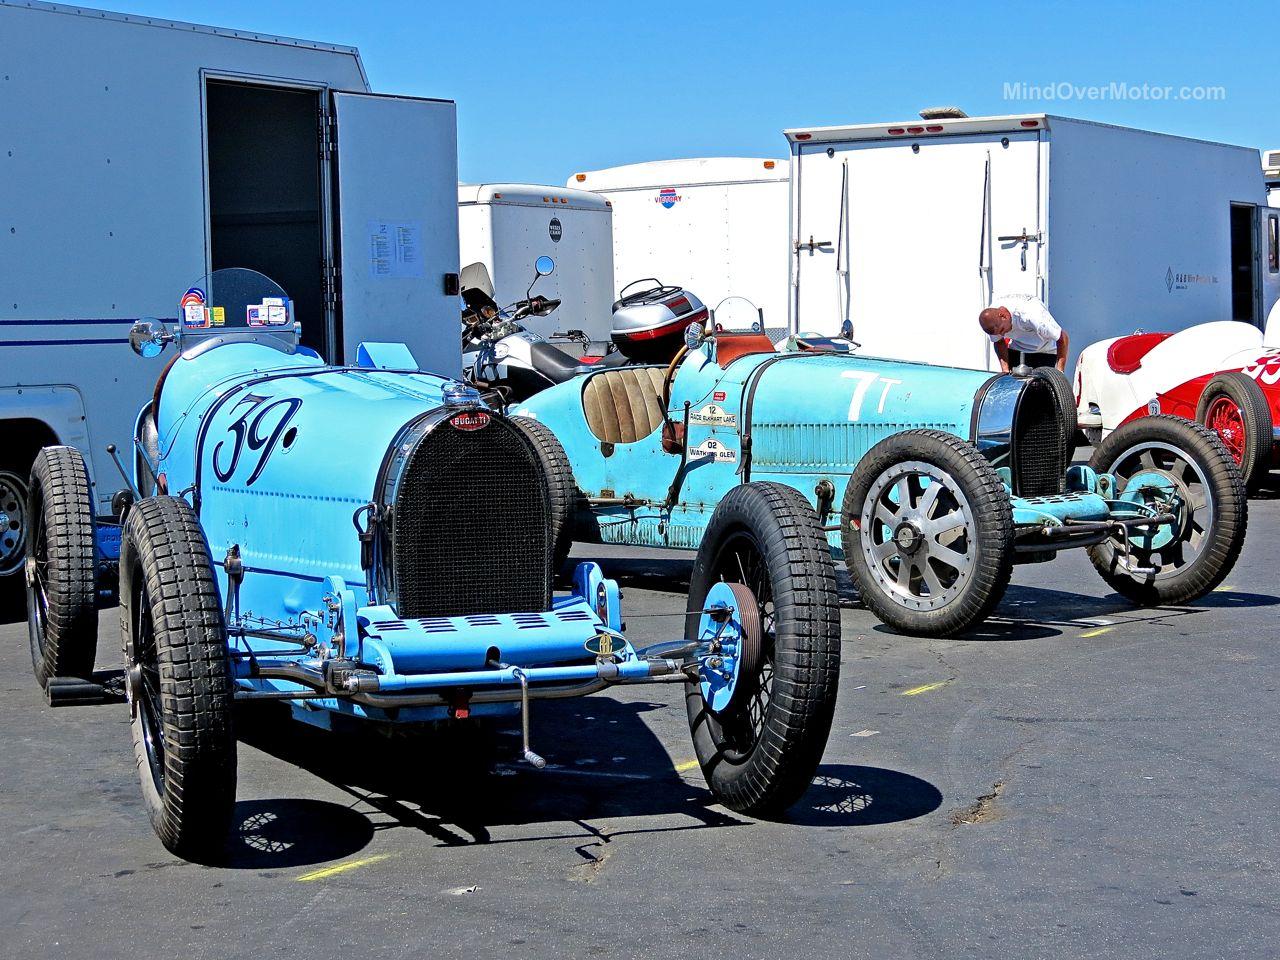 Bugatti Racing Cars Laguna Seca Paddock